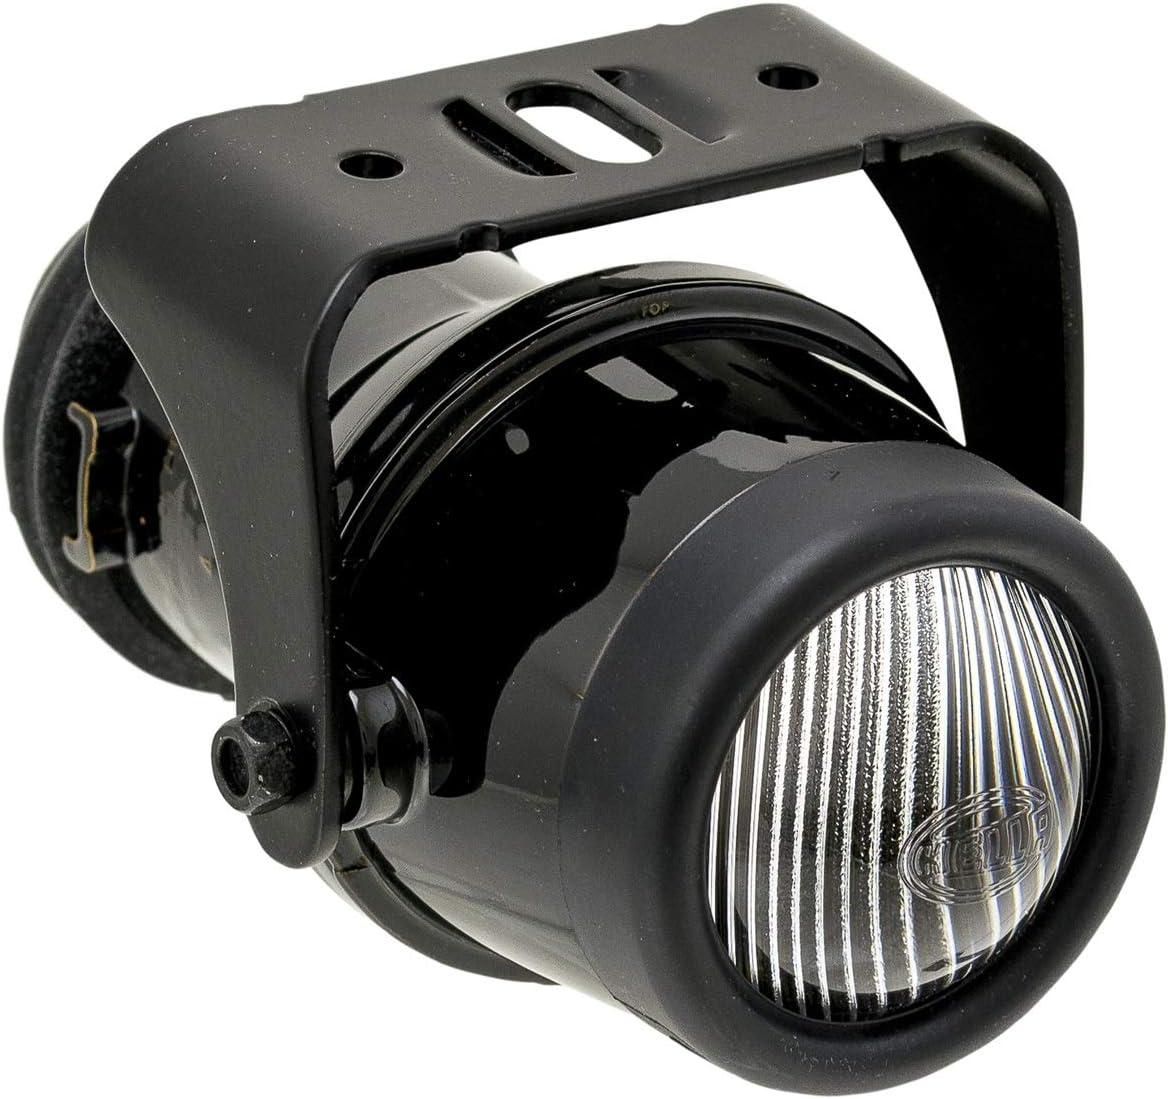 Amazon Com Hella H13090611 Micro De Series 12v 55w Halogen Clear Fog Lamp Kit Automotive